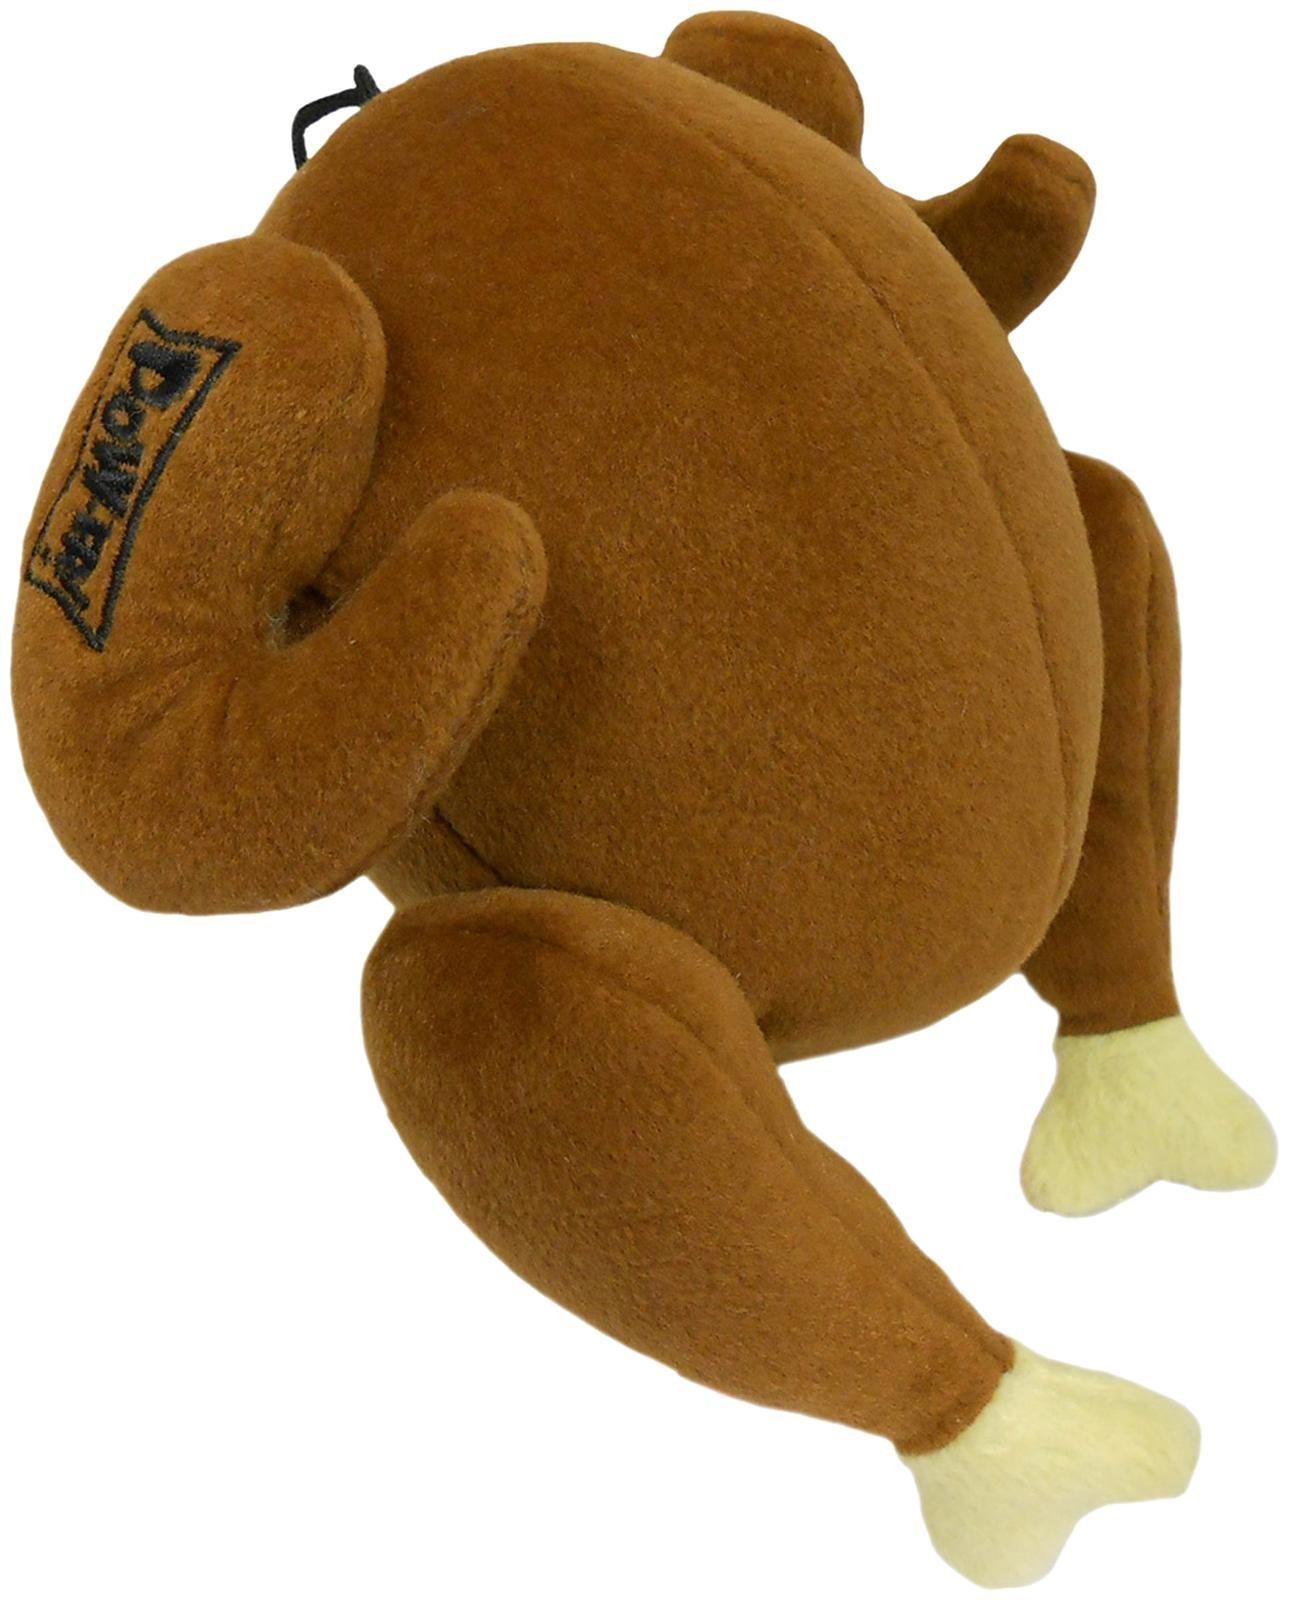 Lulubelles Power Plush Turkey Dog Toy - Small